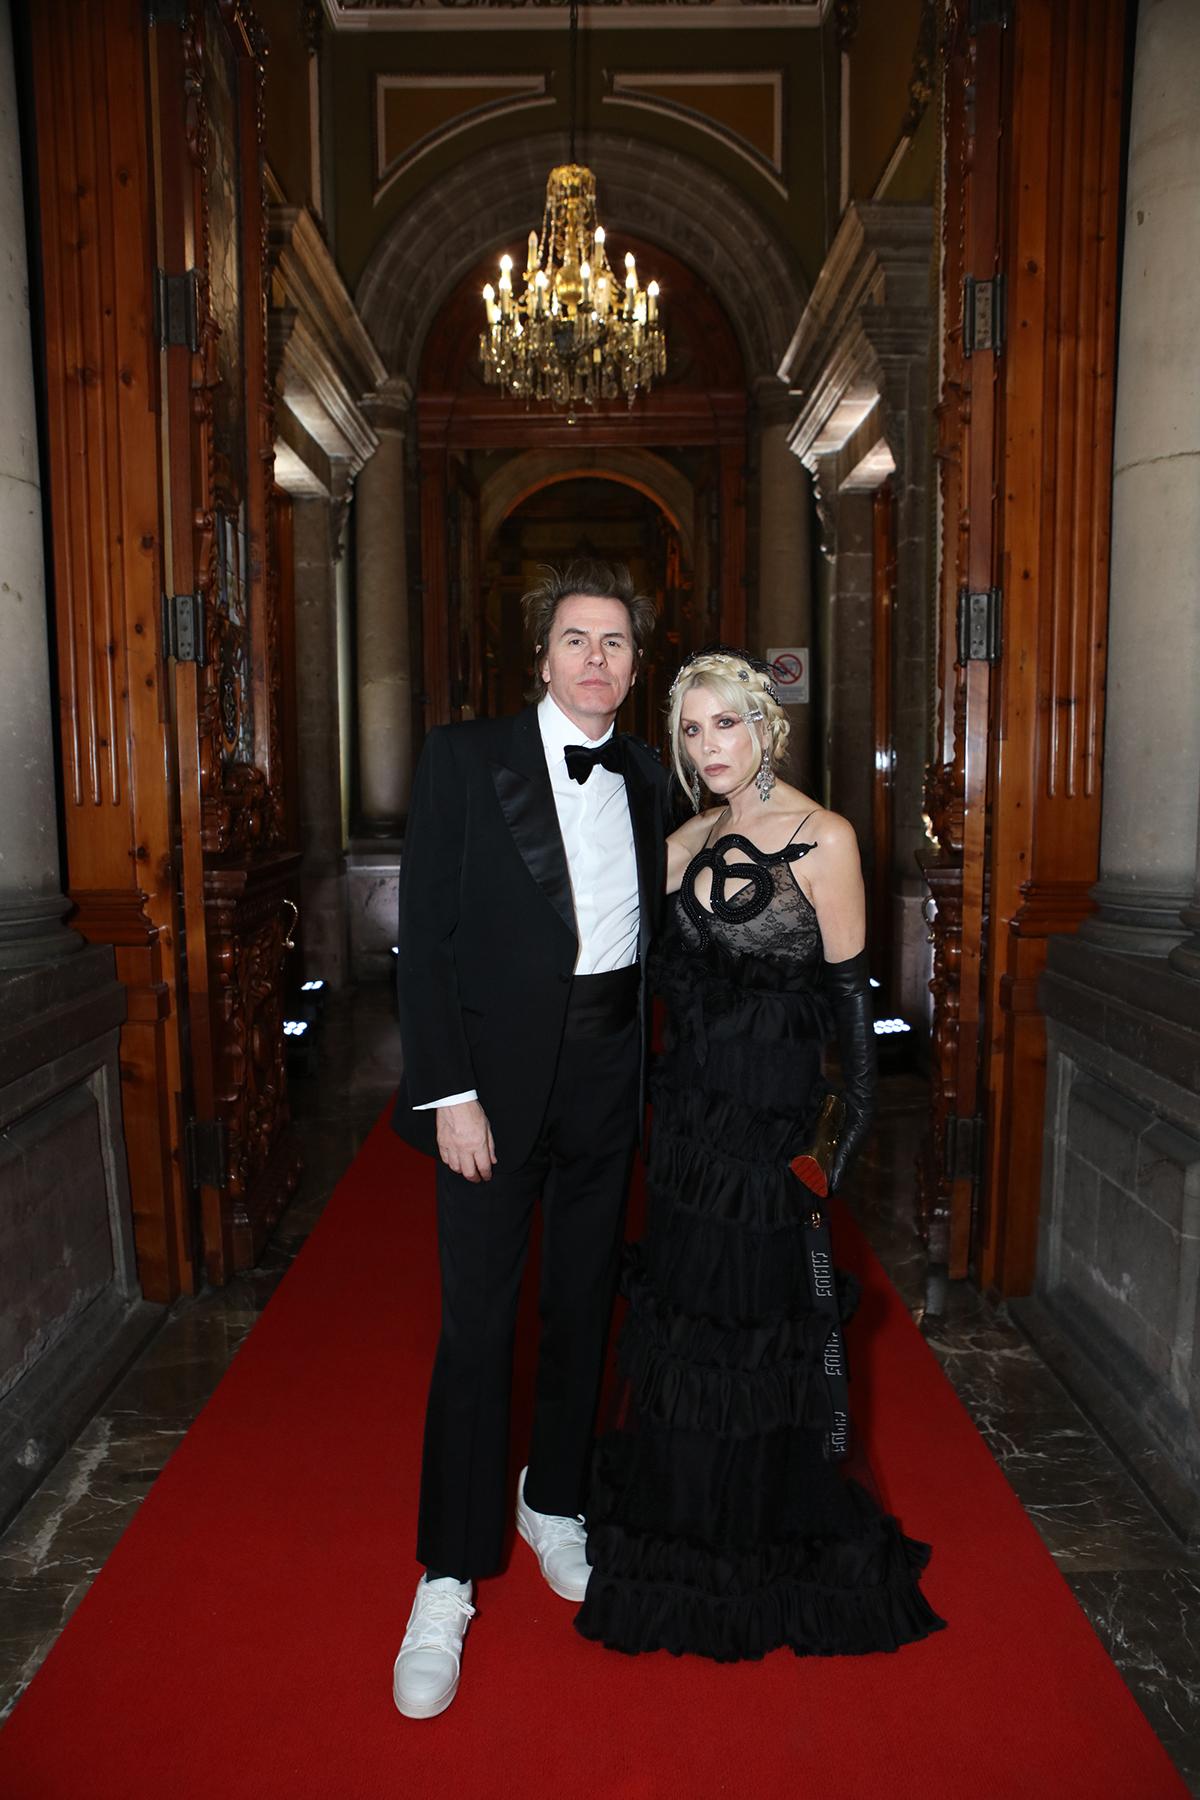 John and Gela Taylor